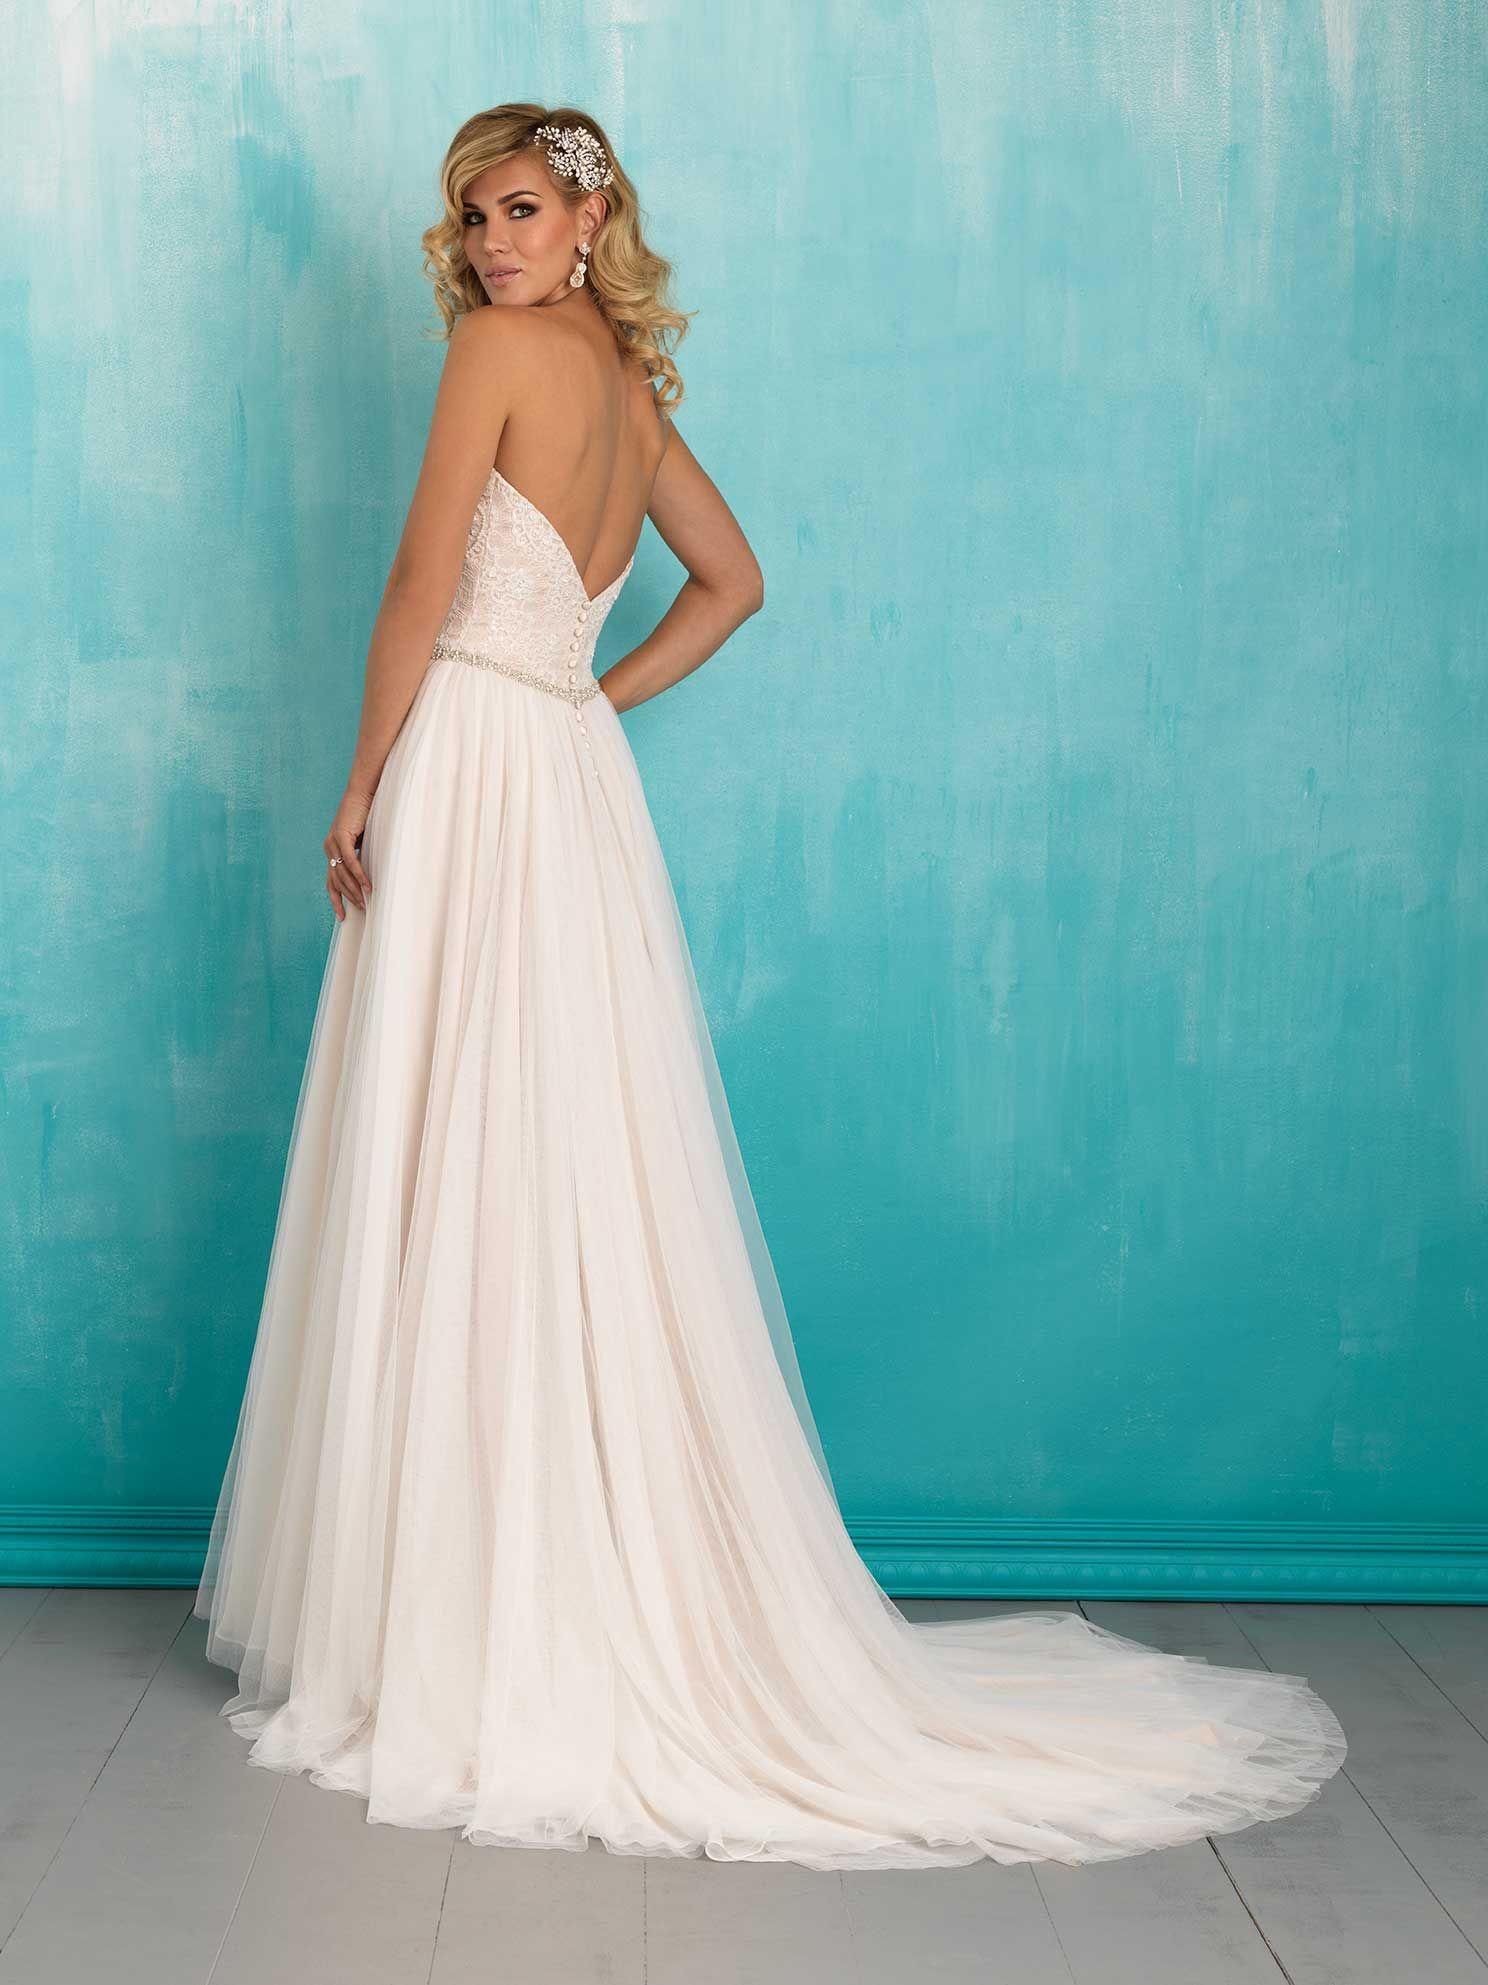 Allure Bridals 9324 Available At Lulu S Bridal Boutique Dallas Texas Wedding Dressesbridal